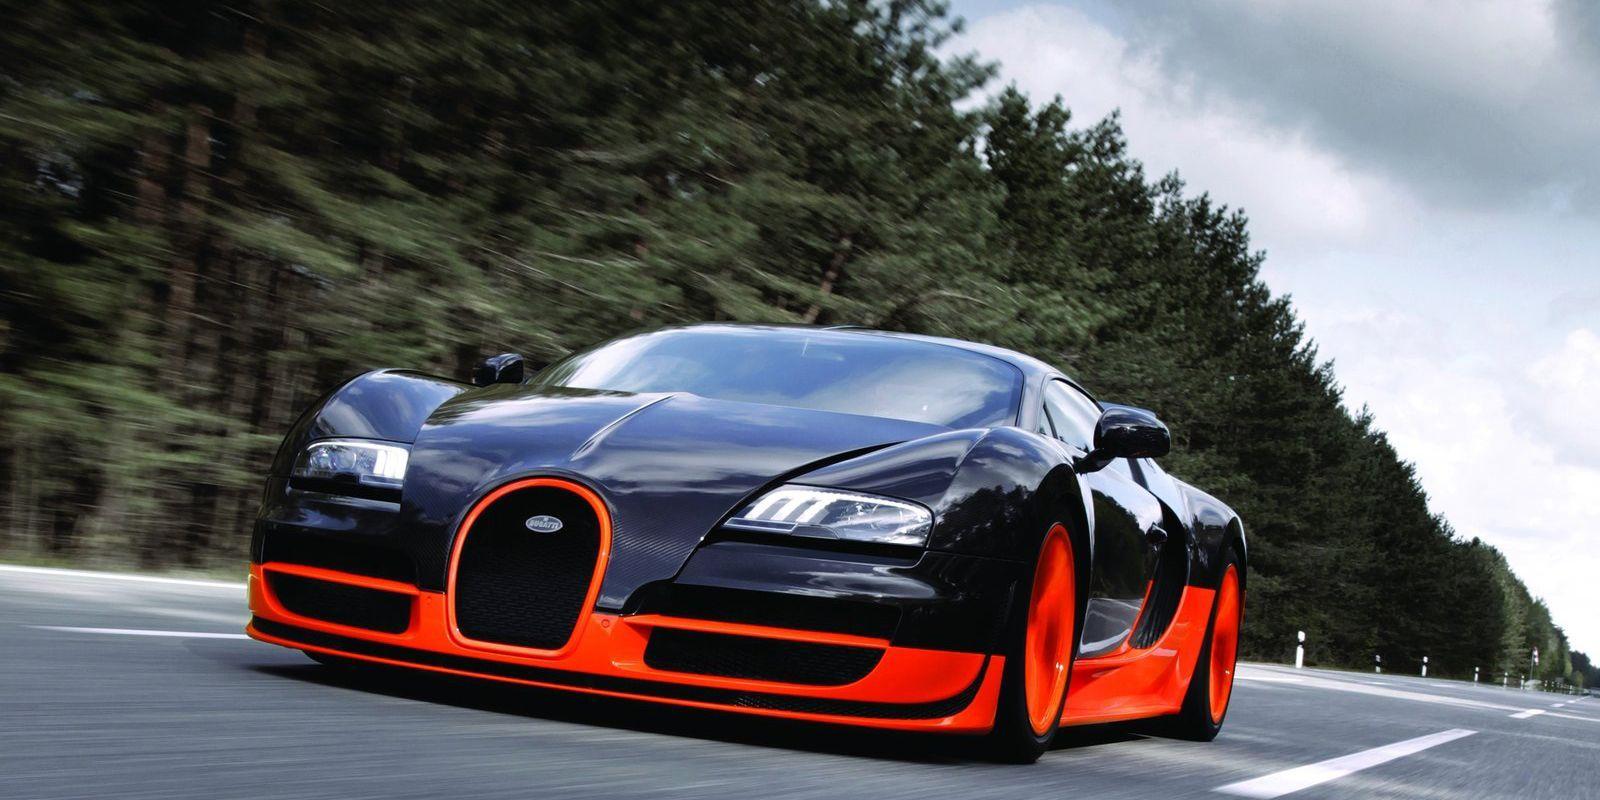 The 17 Best All Wheel Drive Supercars Bugatti Veyron Super Sport Bugatti Veyron Bugatti Veyron 16